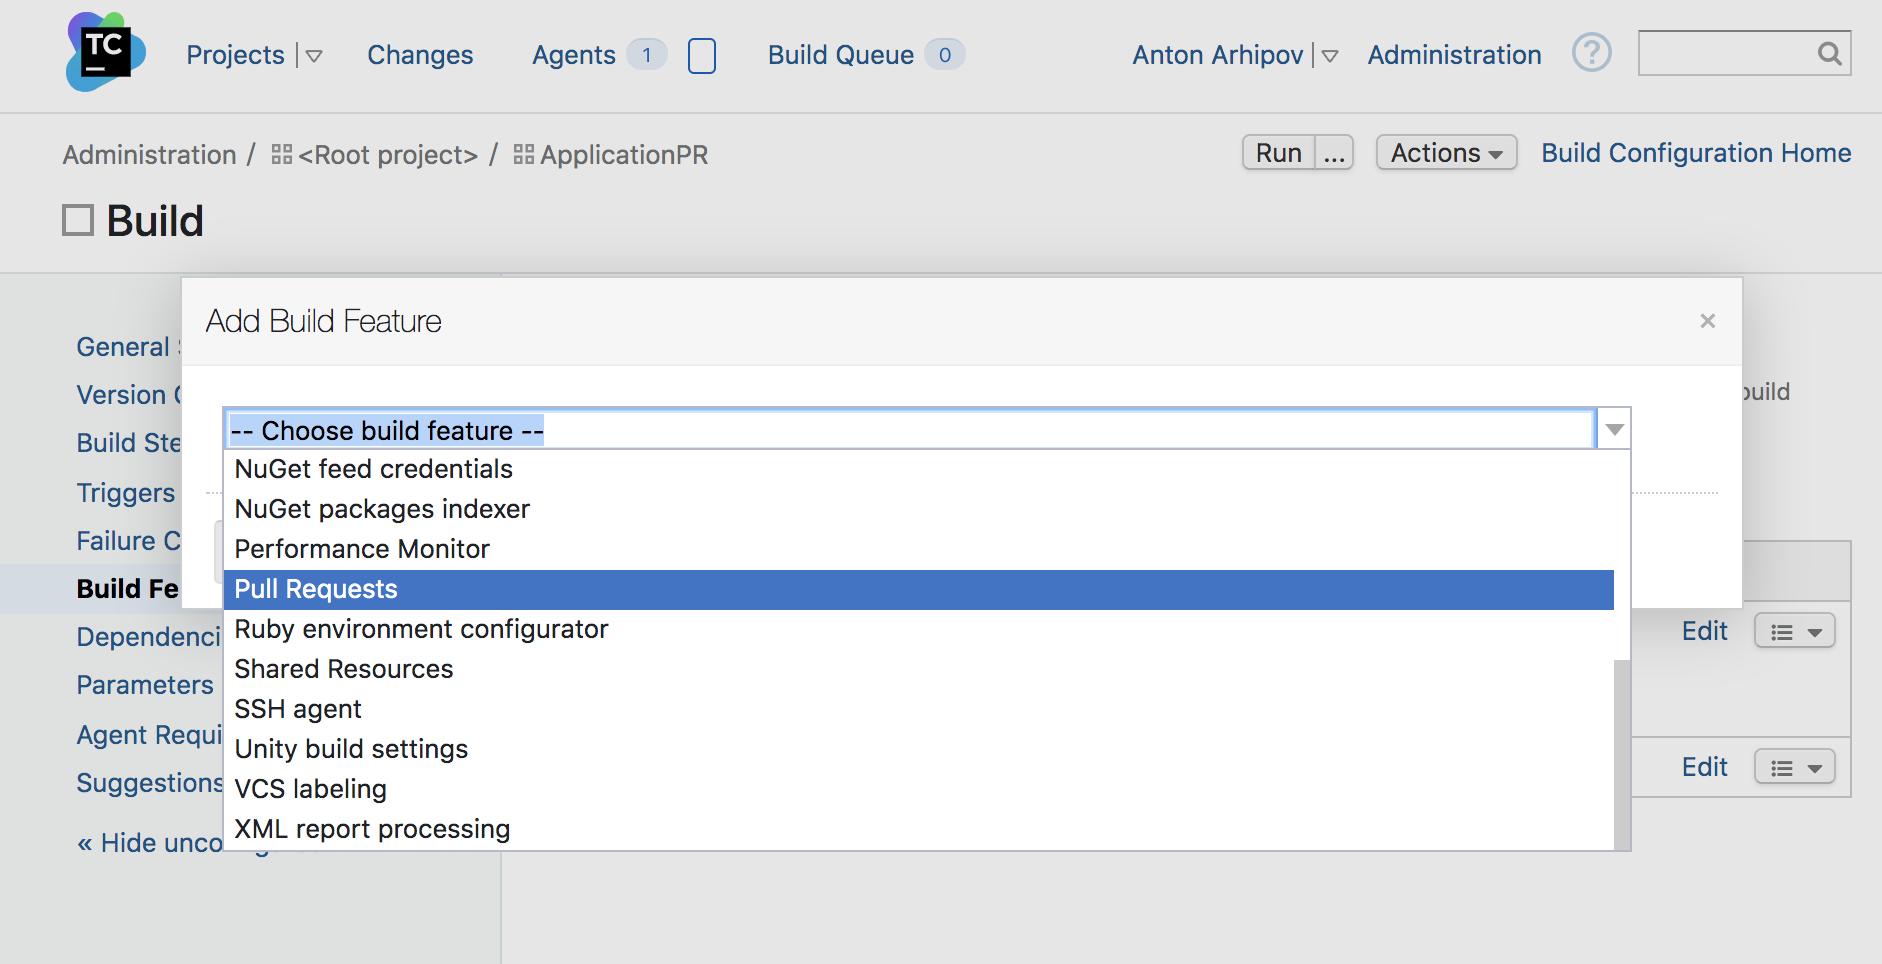 adding-build-feature